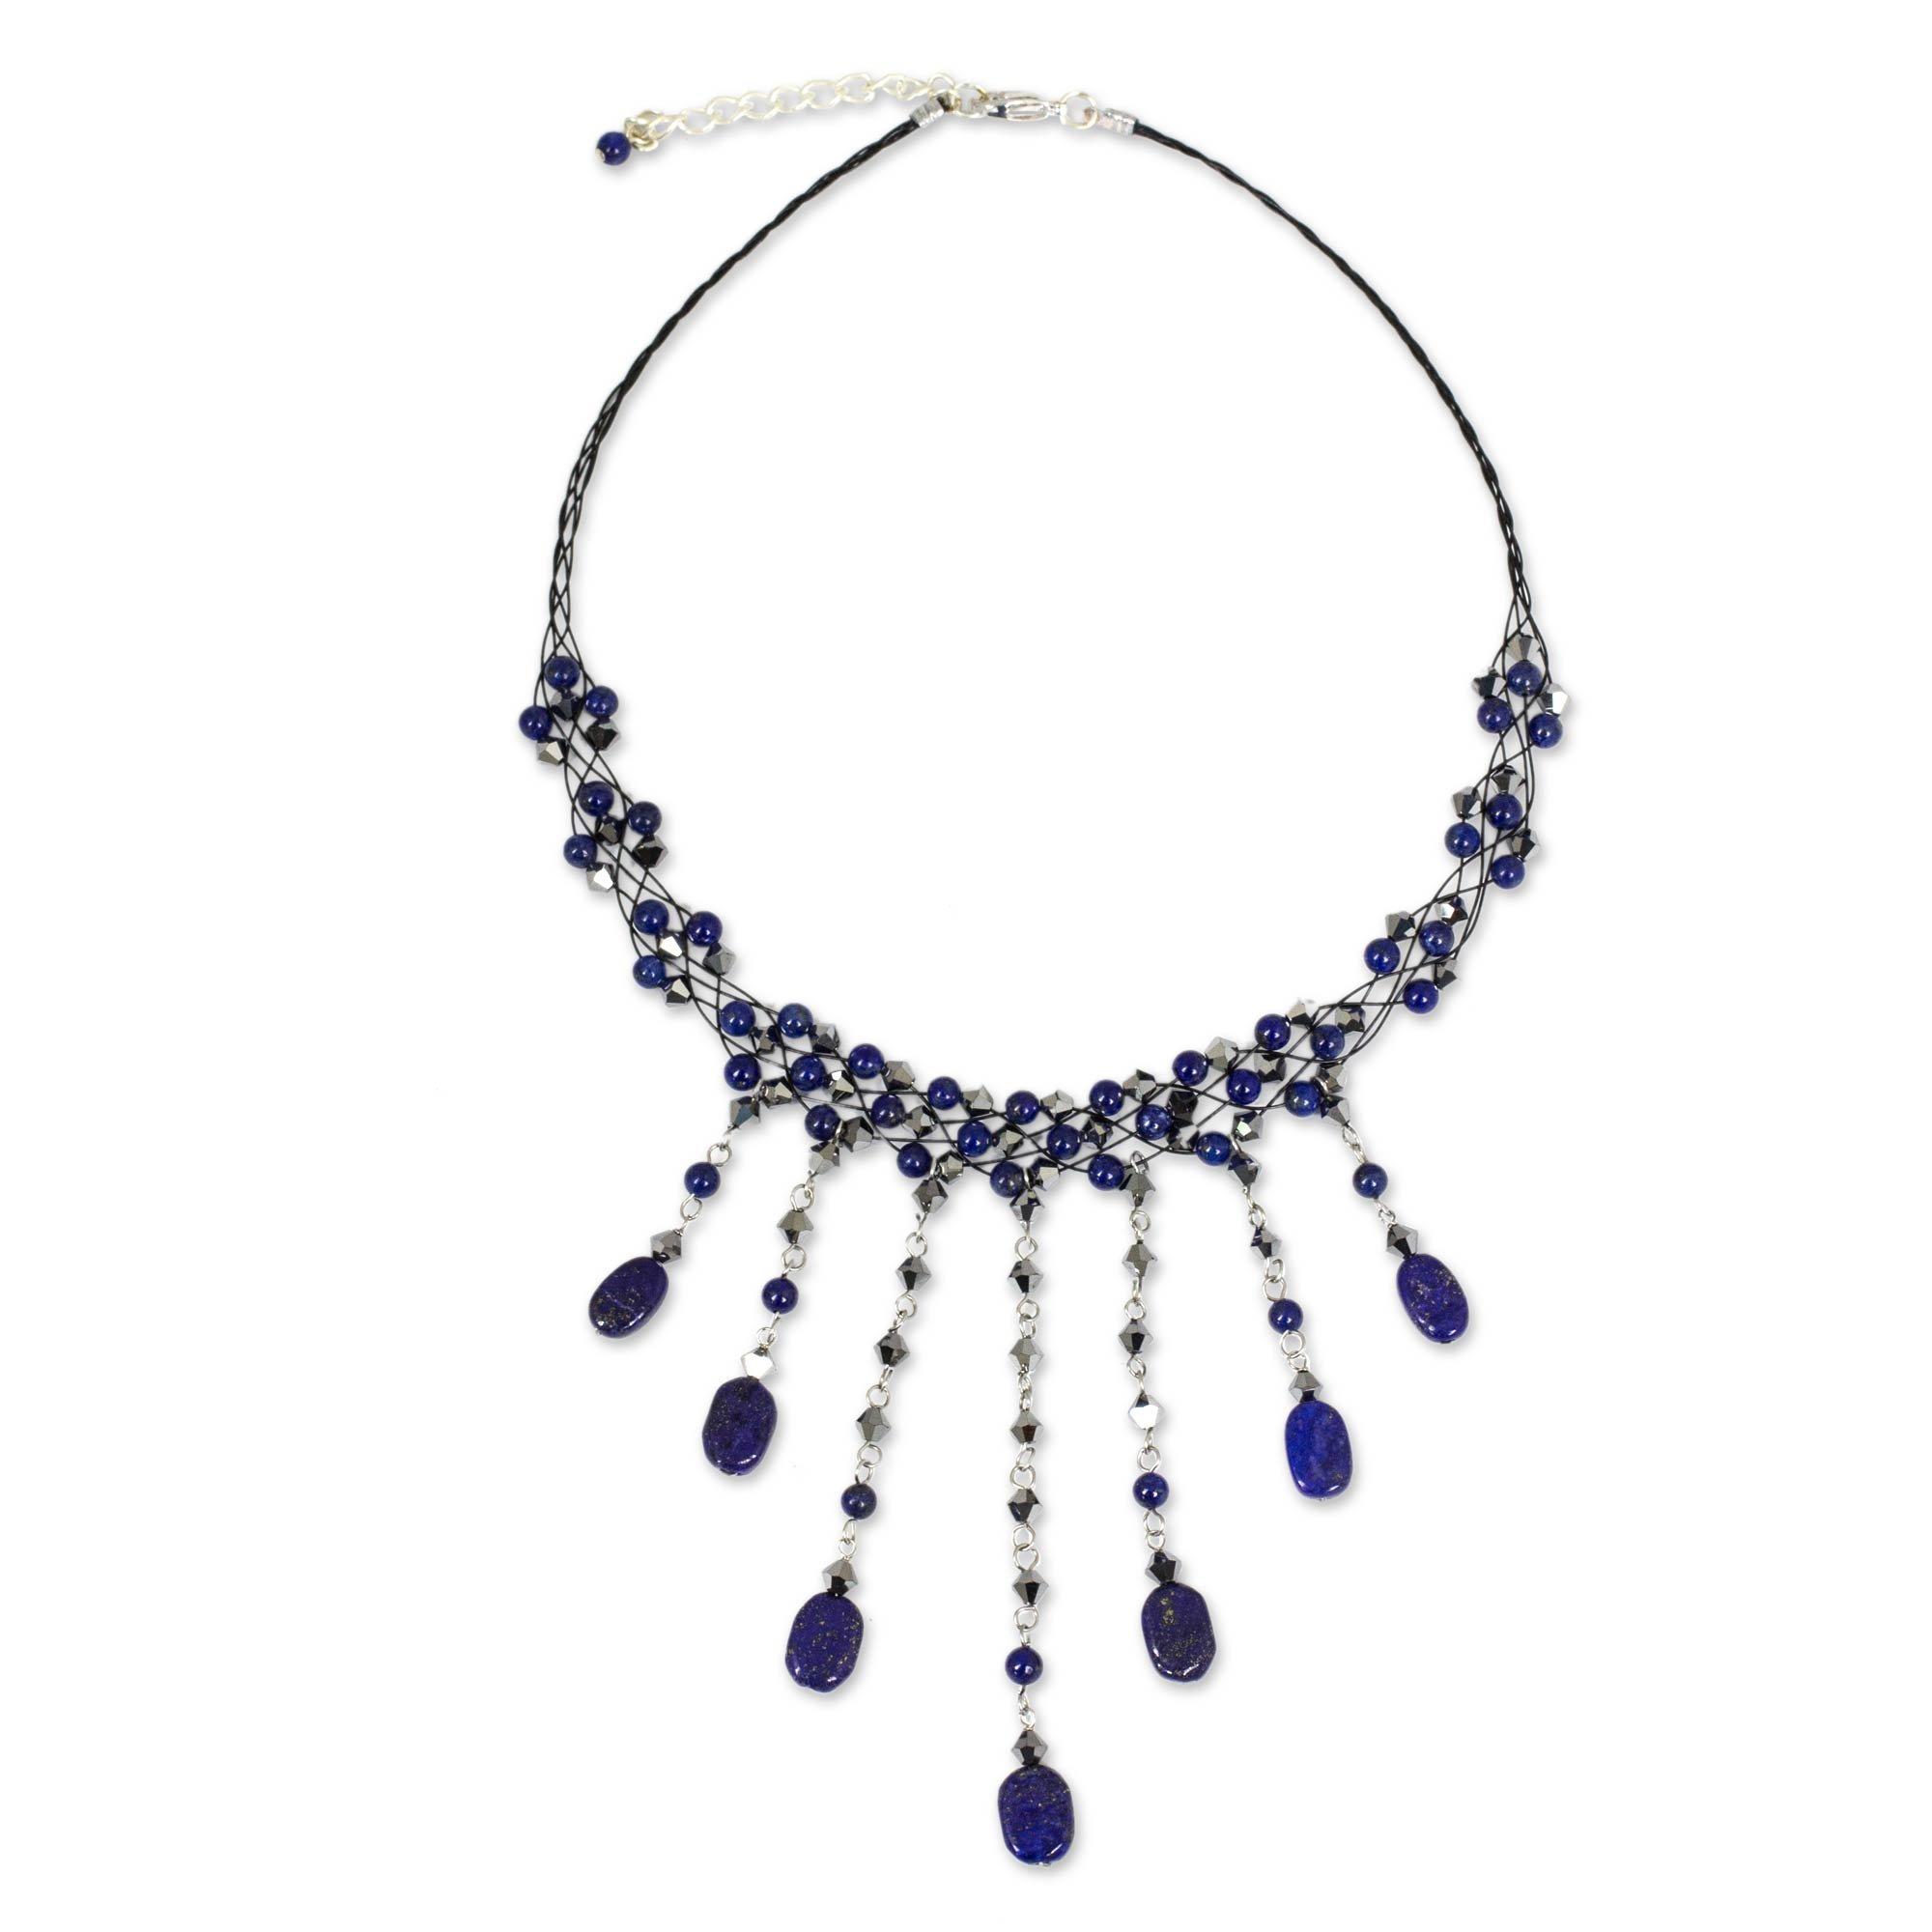 NOVICA Lapis Lazuli Stainless Steel Beaded Choker Necklace, 14.5'' 'Rain Shower'